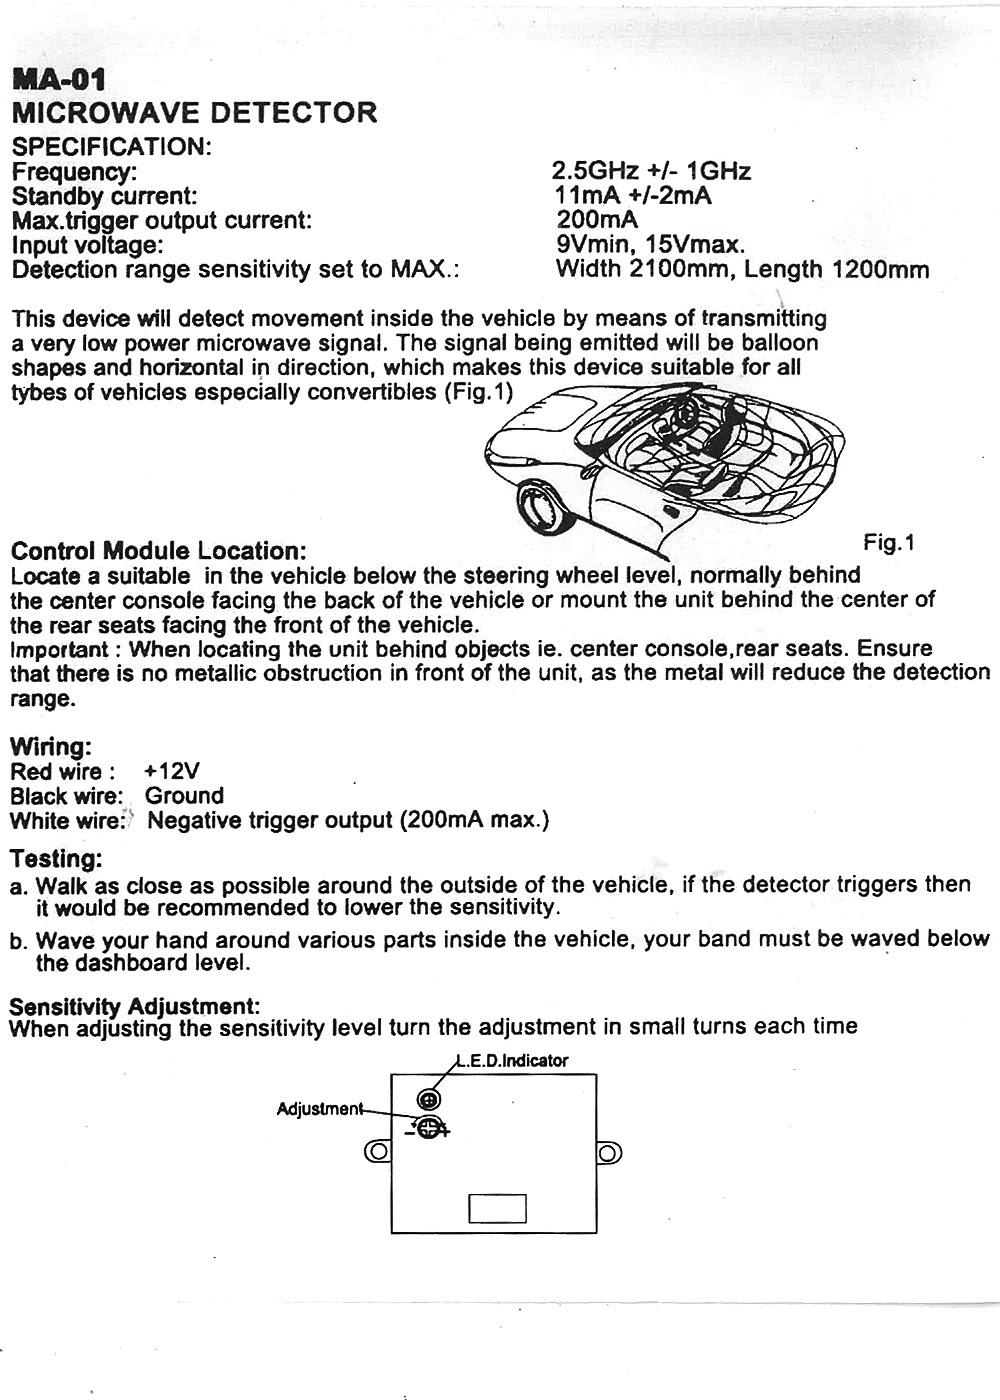 Mazda 323 Astina Fuse Box